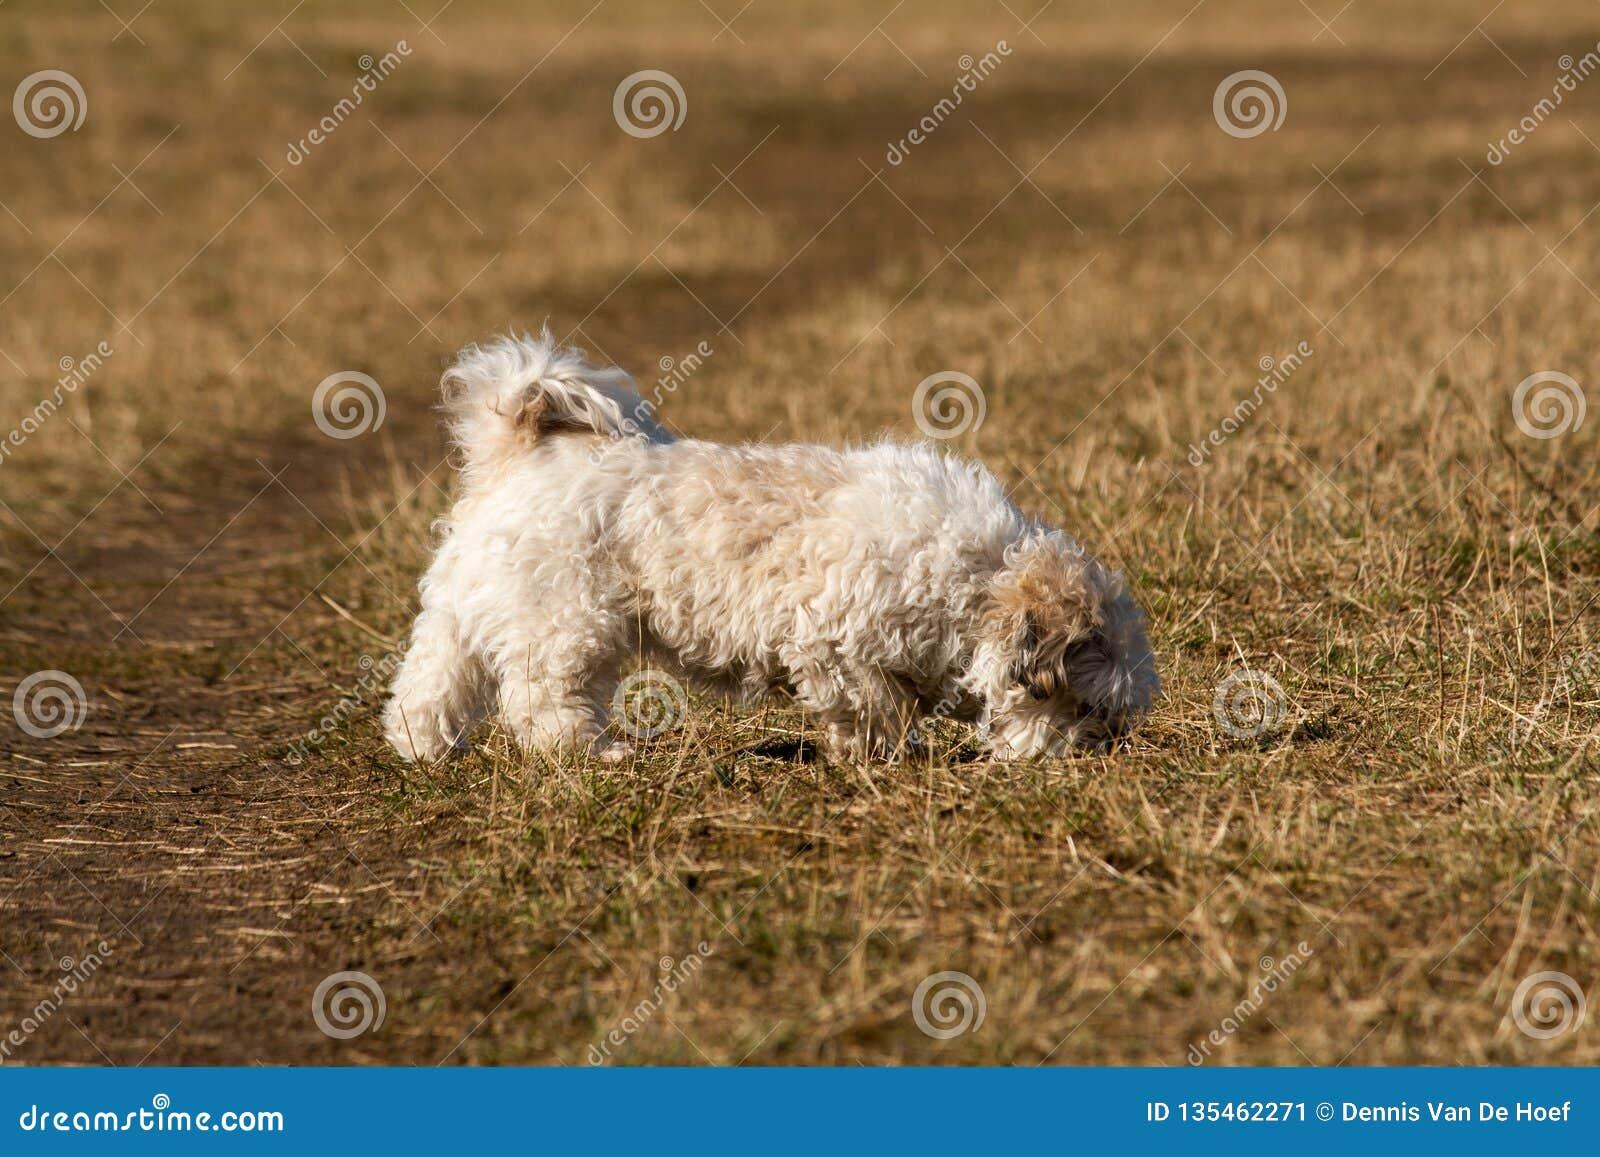 Small crossbreed dog walking.